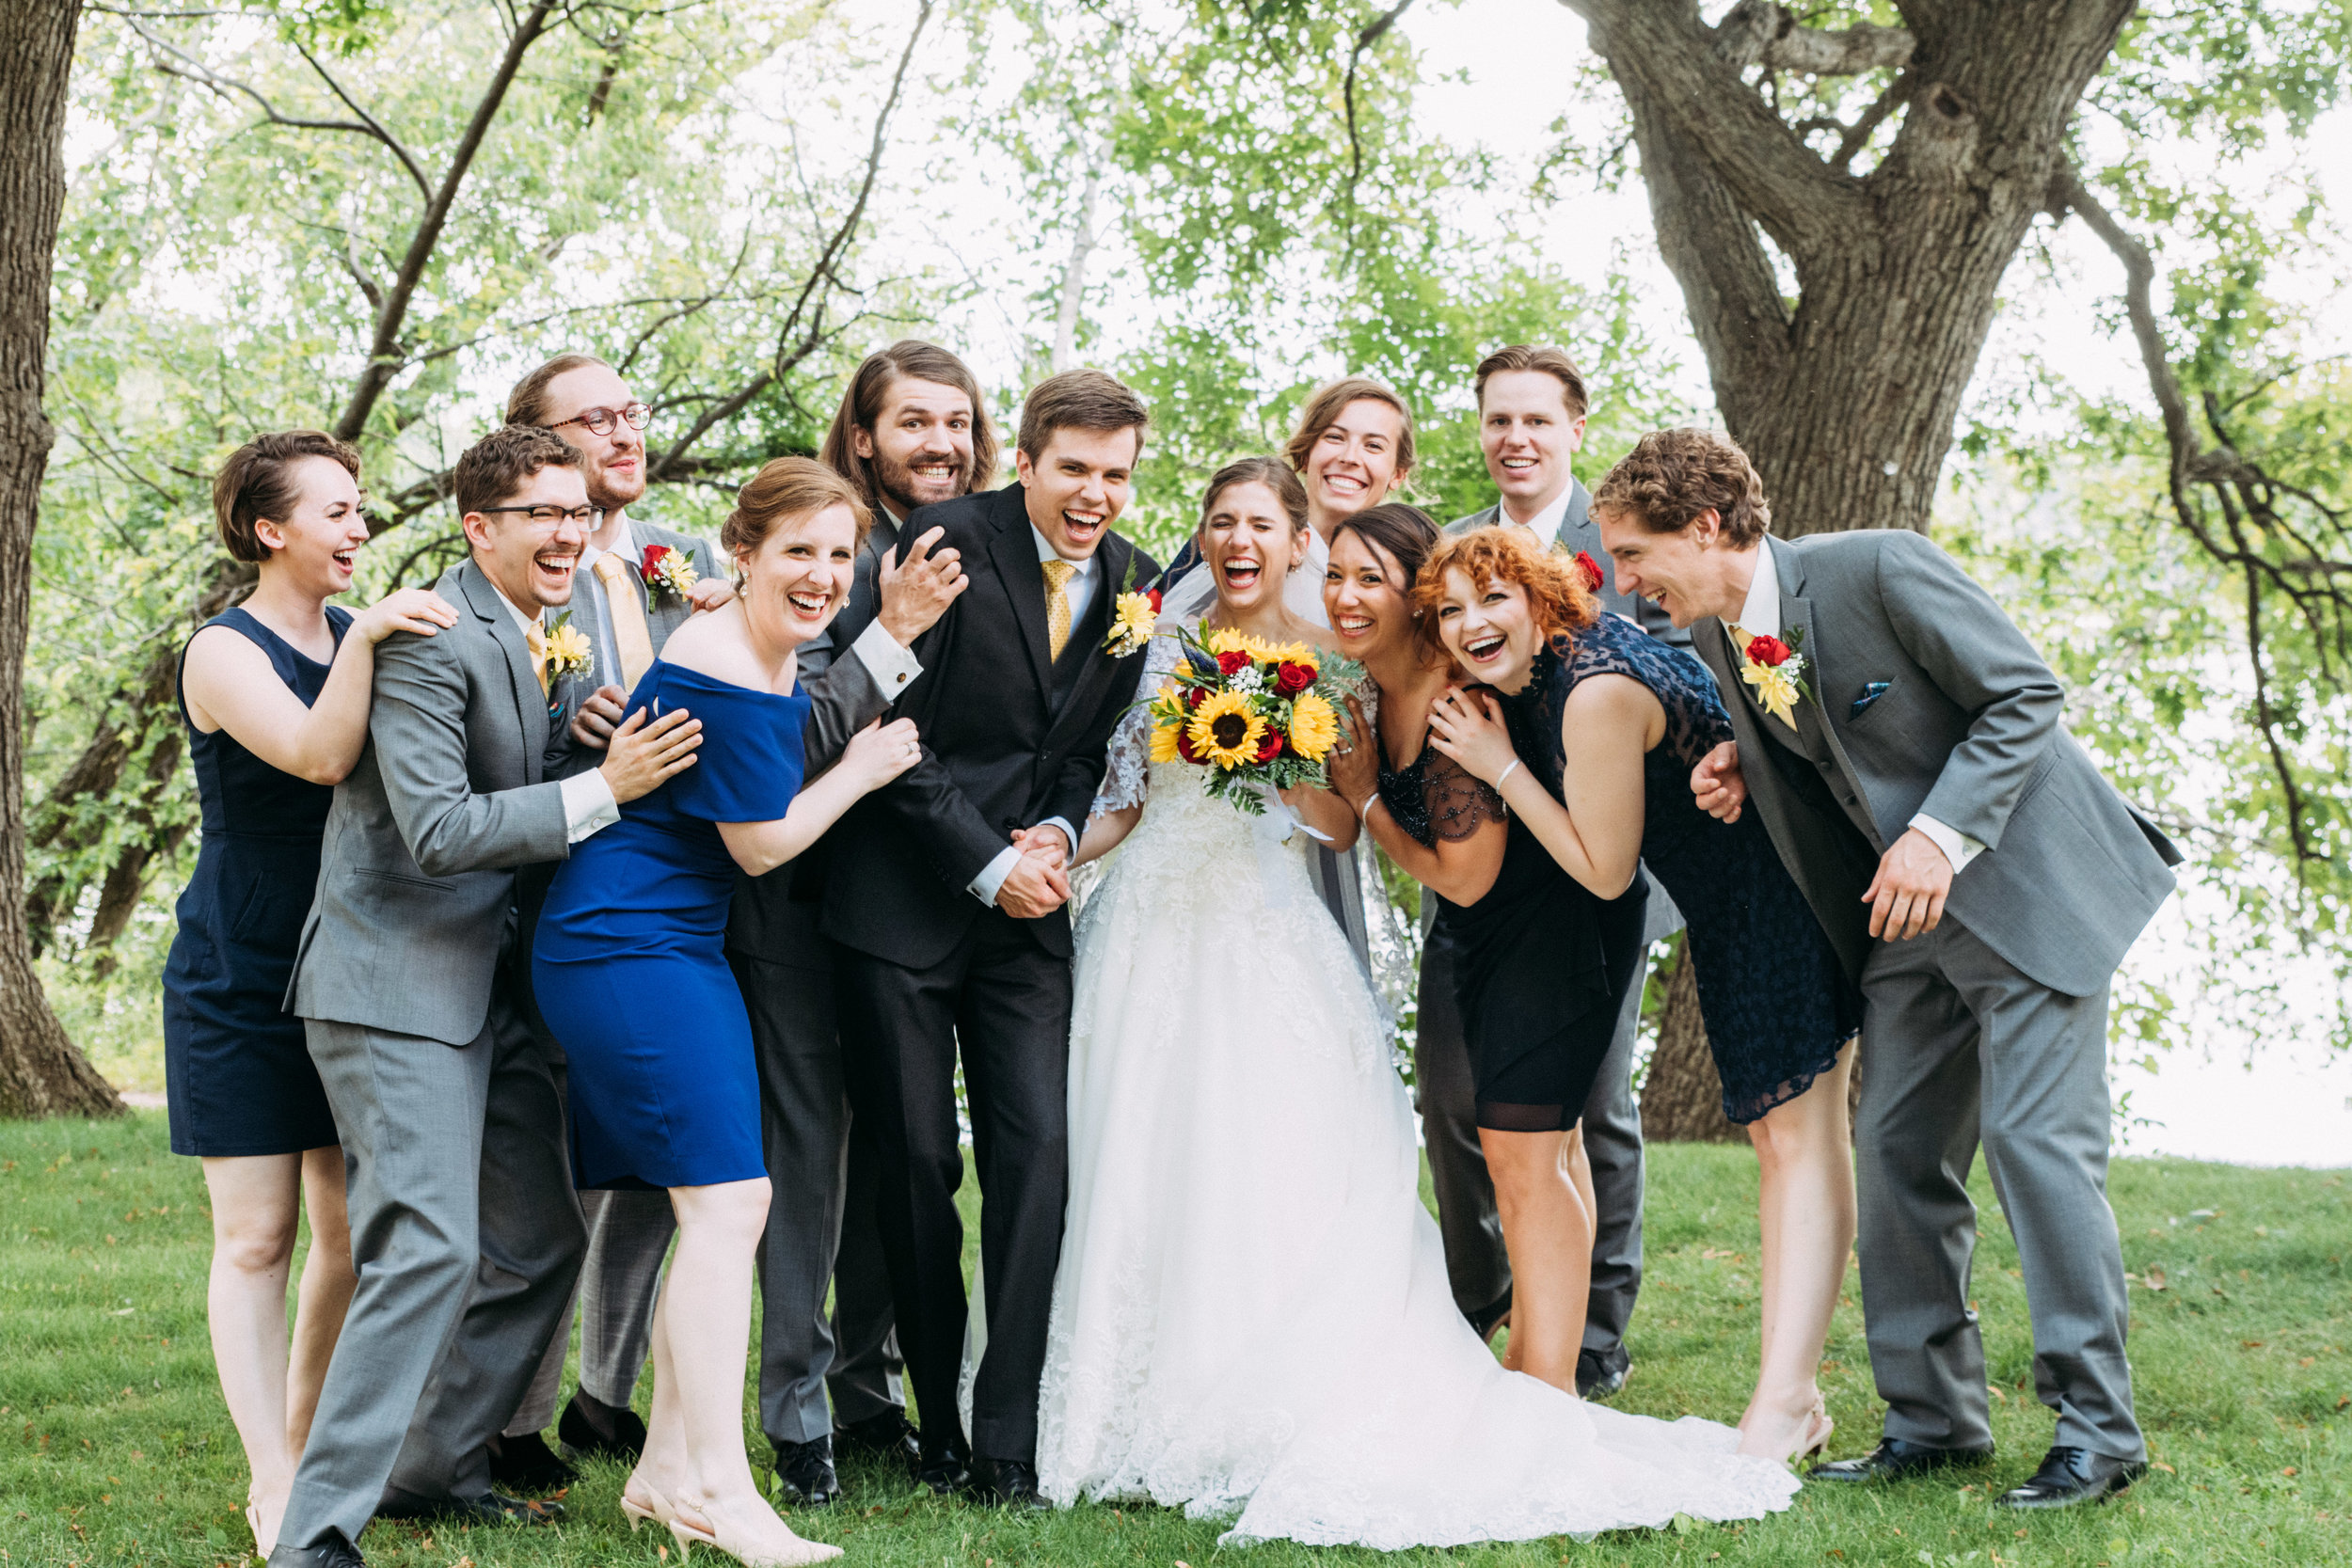 20-Liza_Chris_Minneapolis_Minnesota_Wedding.jpg